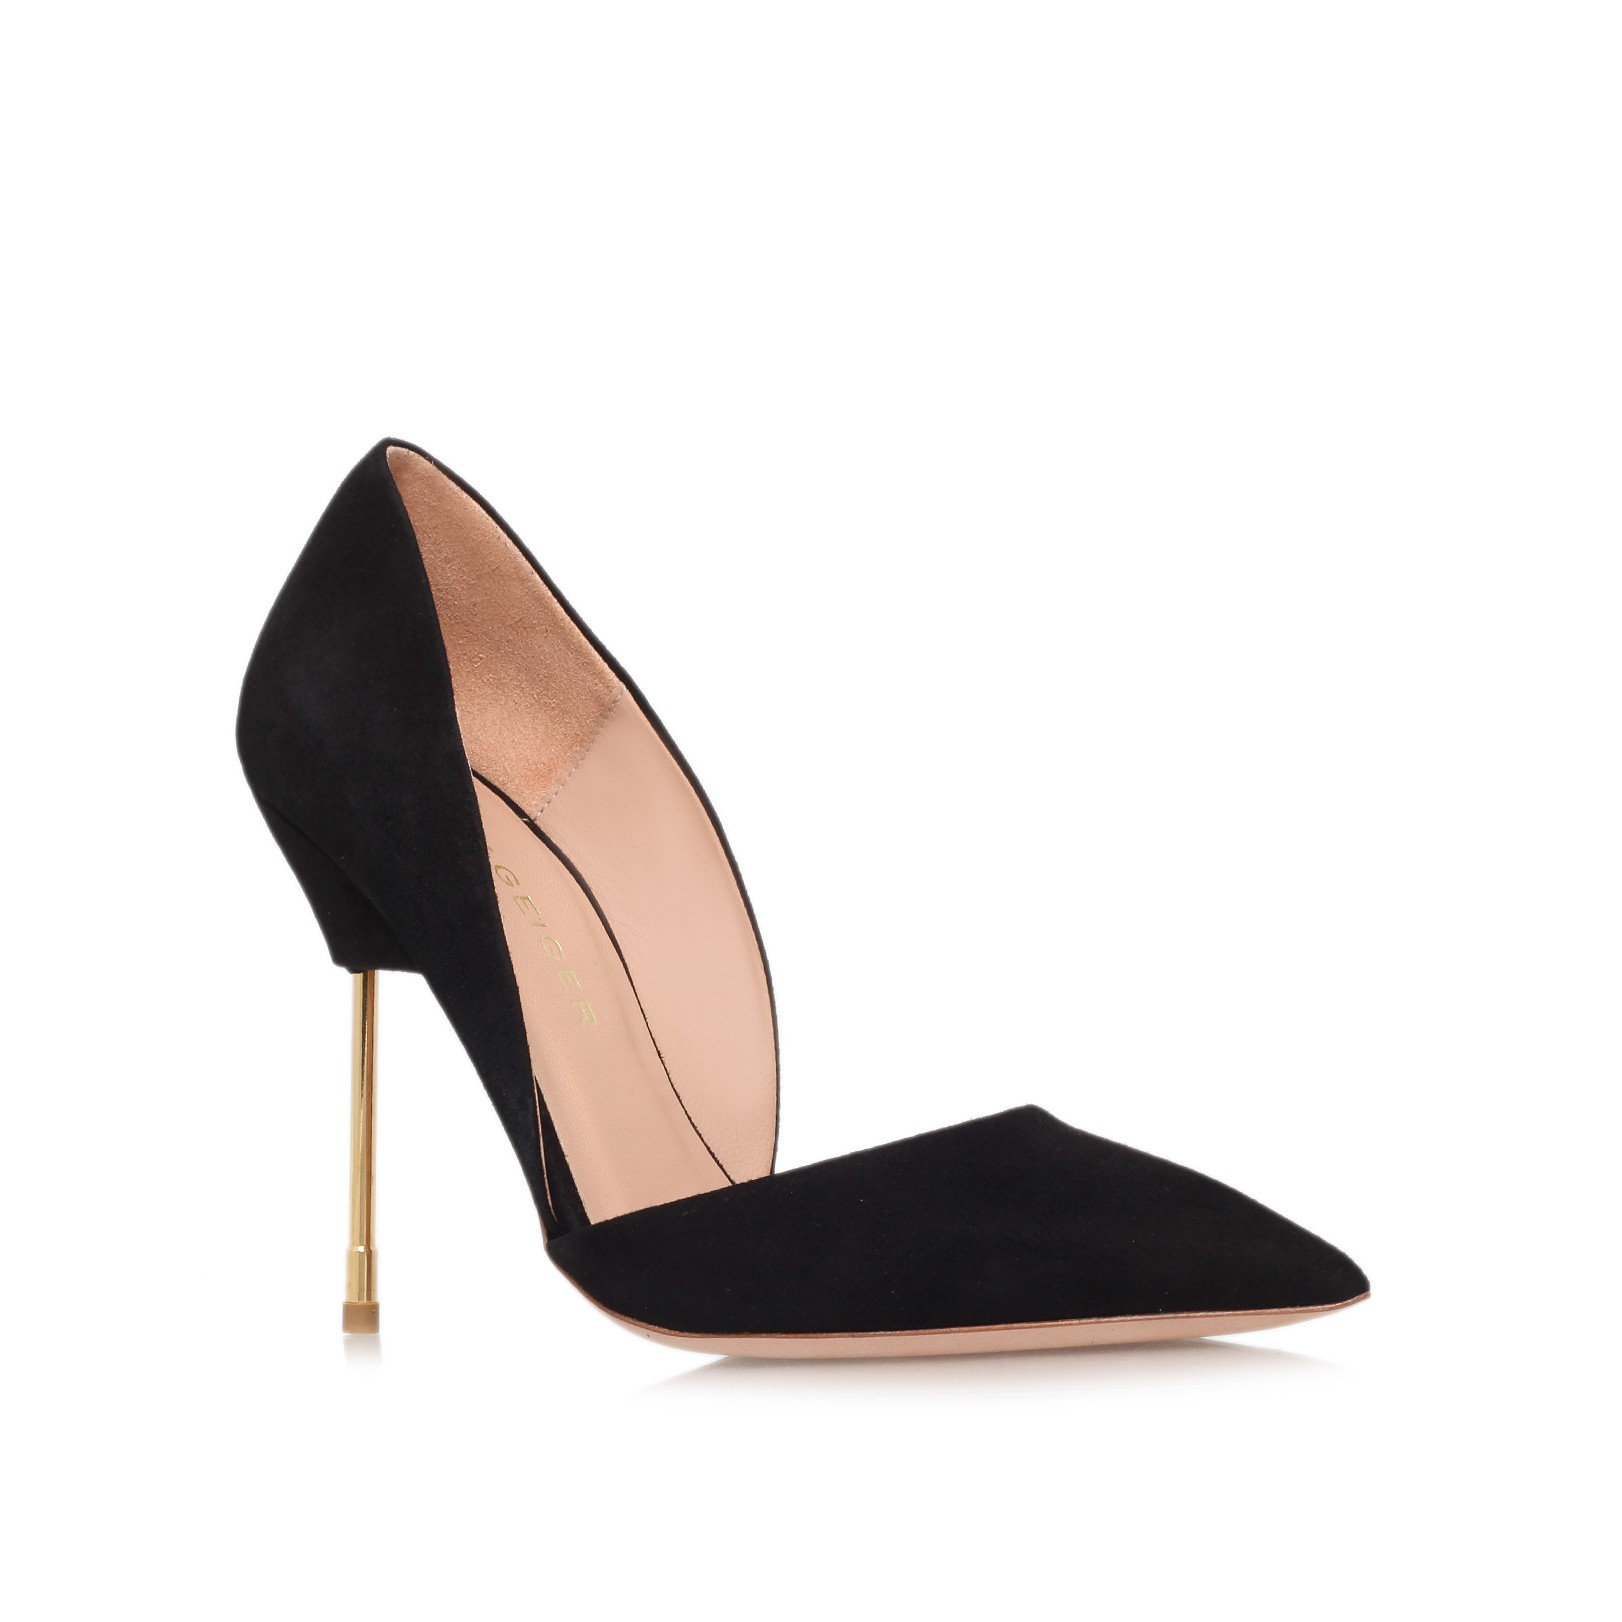 BOND Black High Heel Court Shoes by